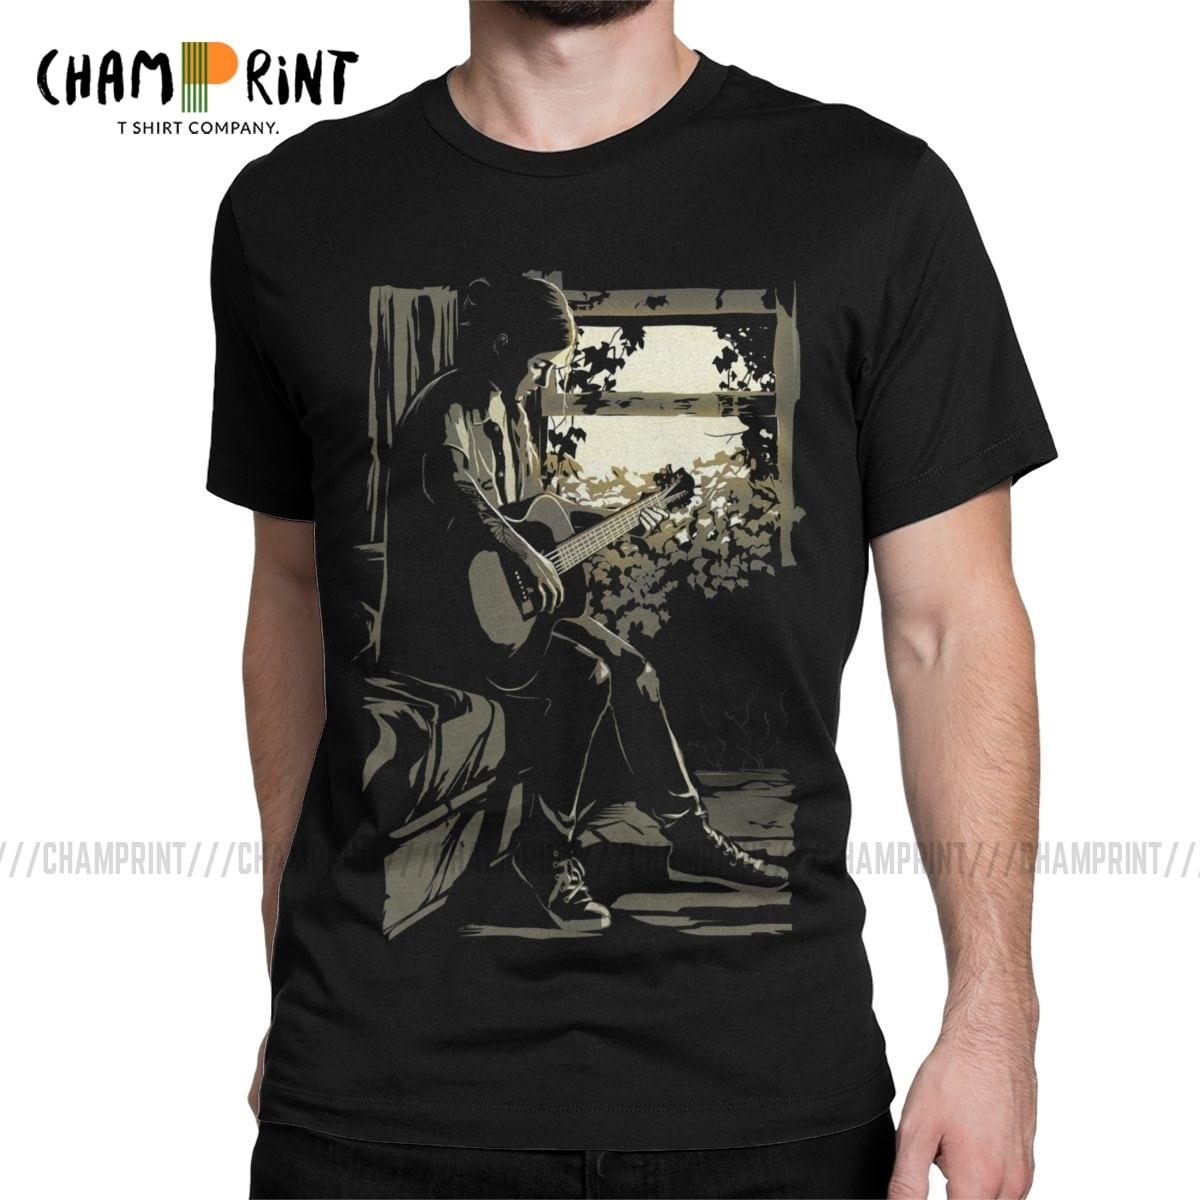 Men's T-Shirt The Last Of Us Part II 2 Ellie Vintage Pure Cotton Tee Shirt Short Sleeve T Shirt Round Neck Clothing Gift Idea